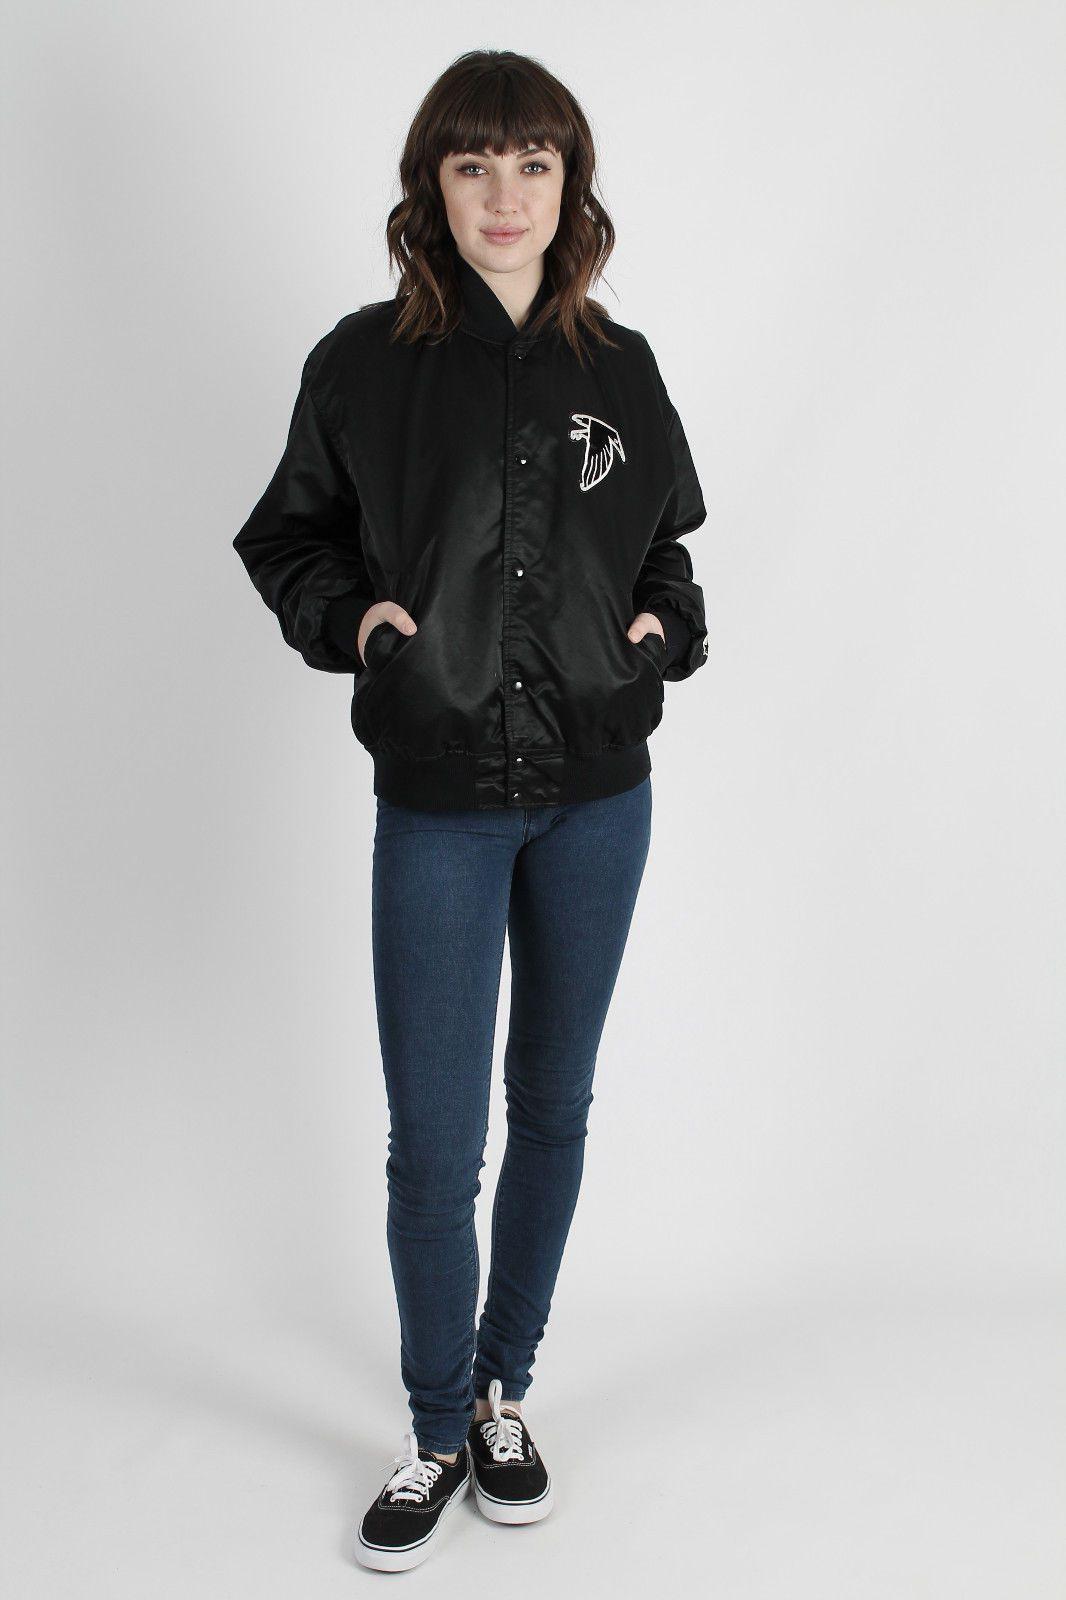 a woman models a vintage Atlanta Falcons jacket